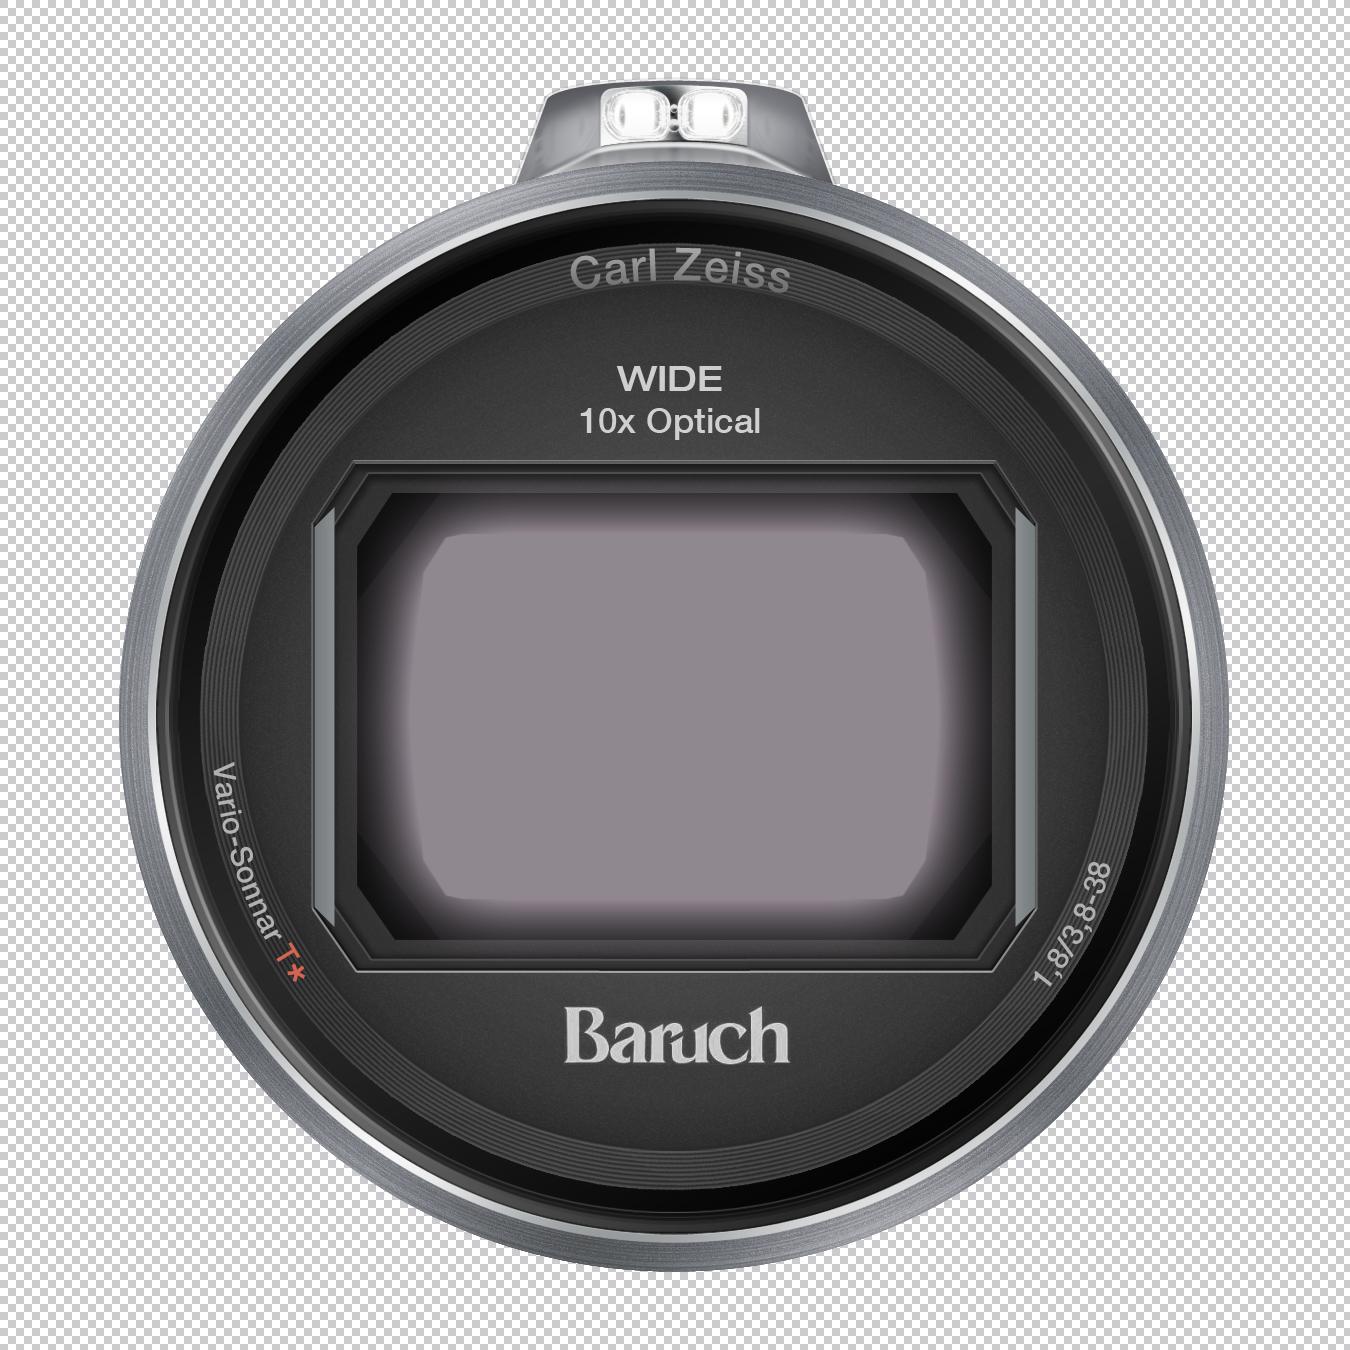 baruchdigital_poster_detail02.jpg